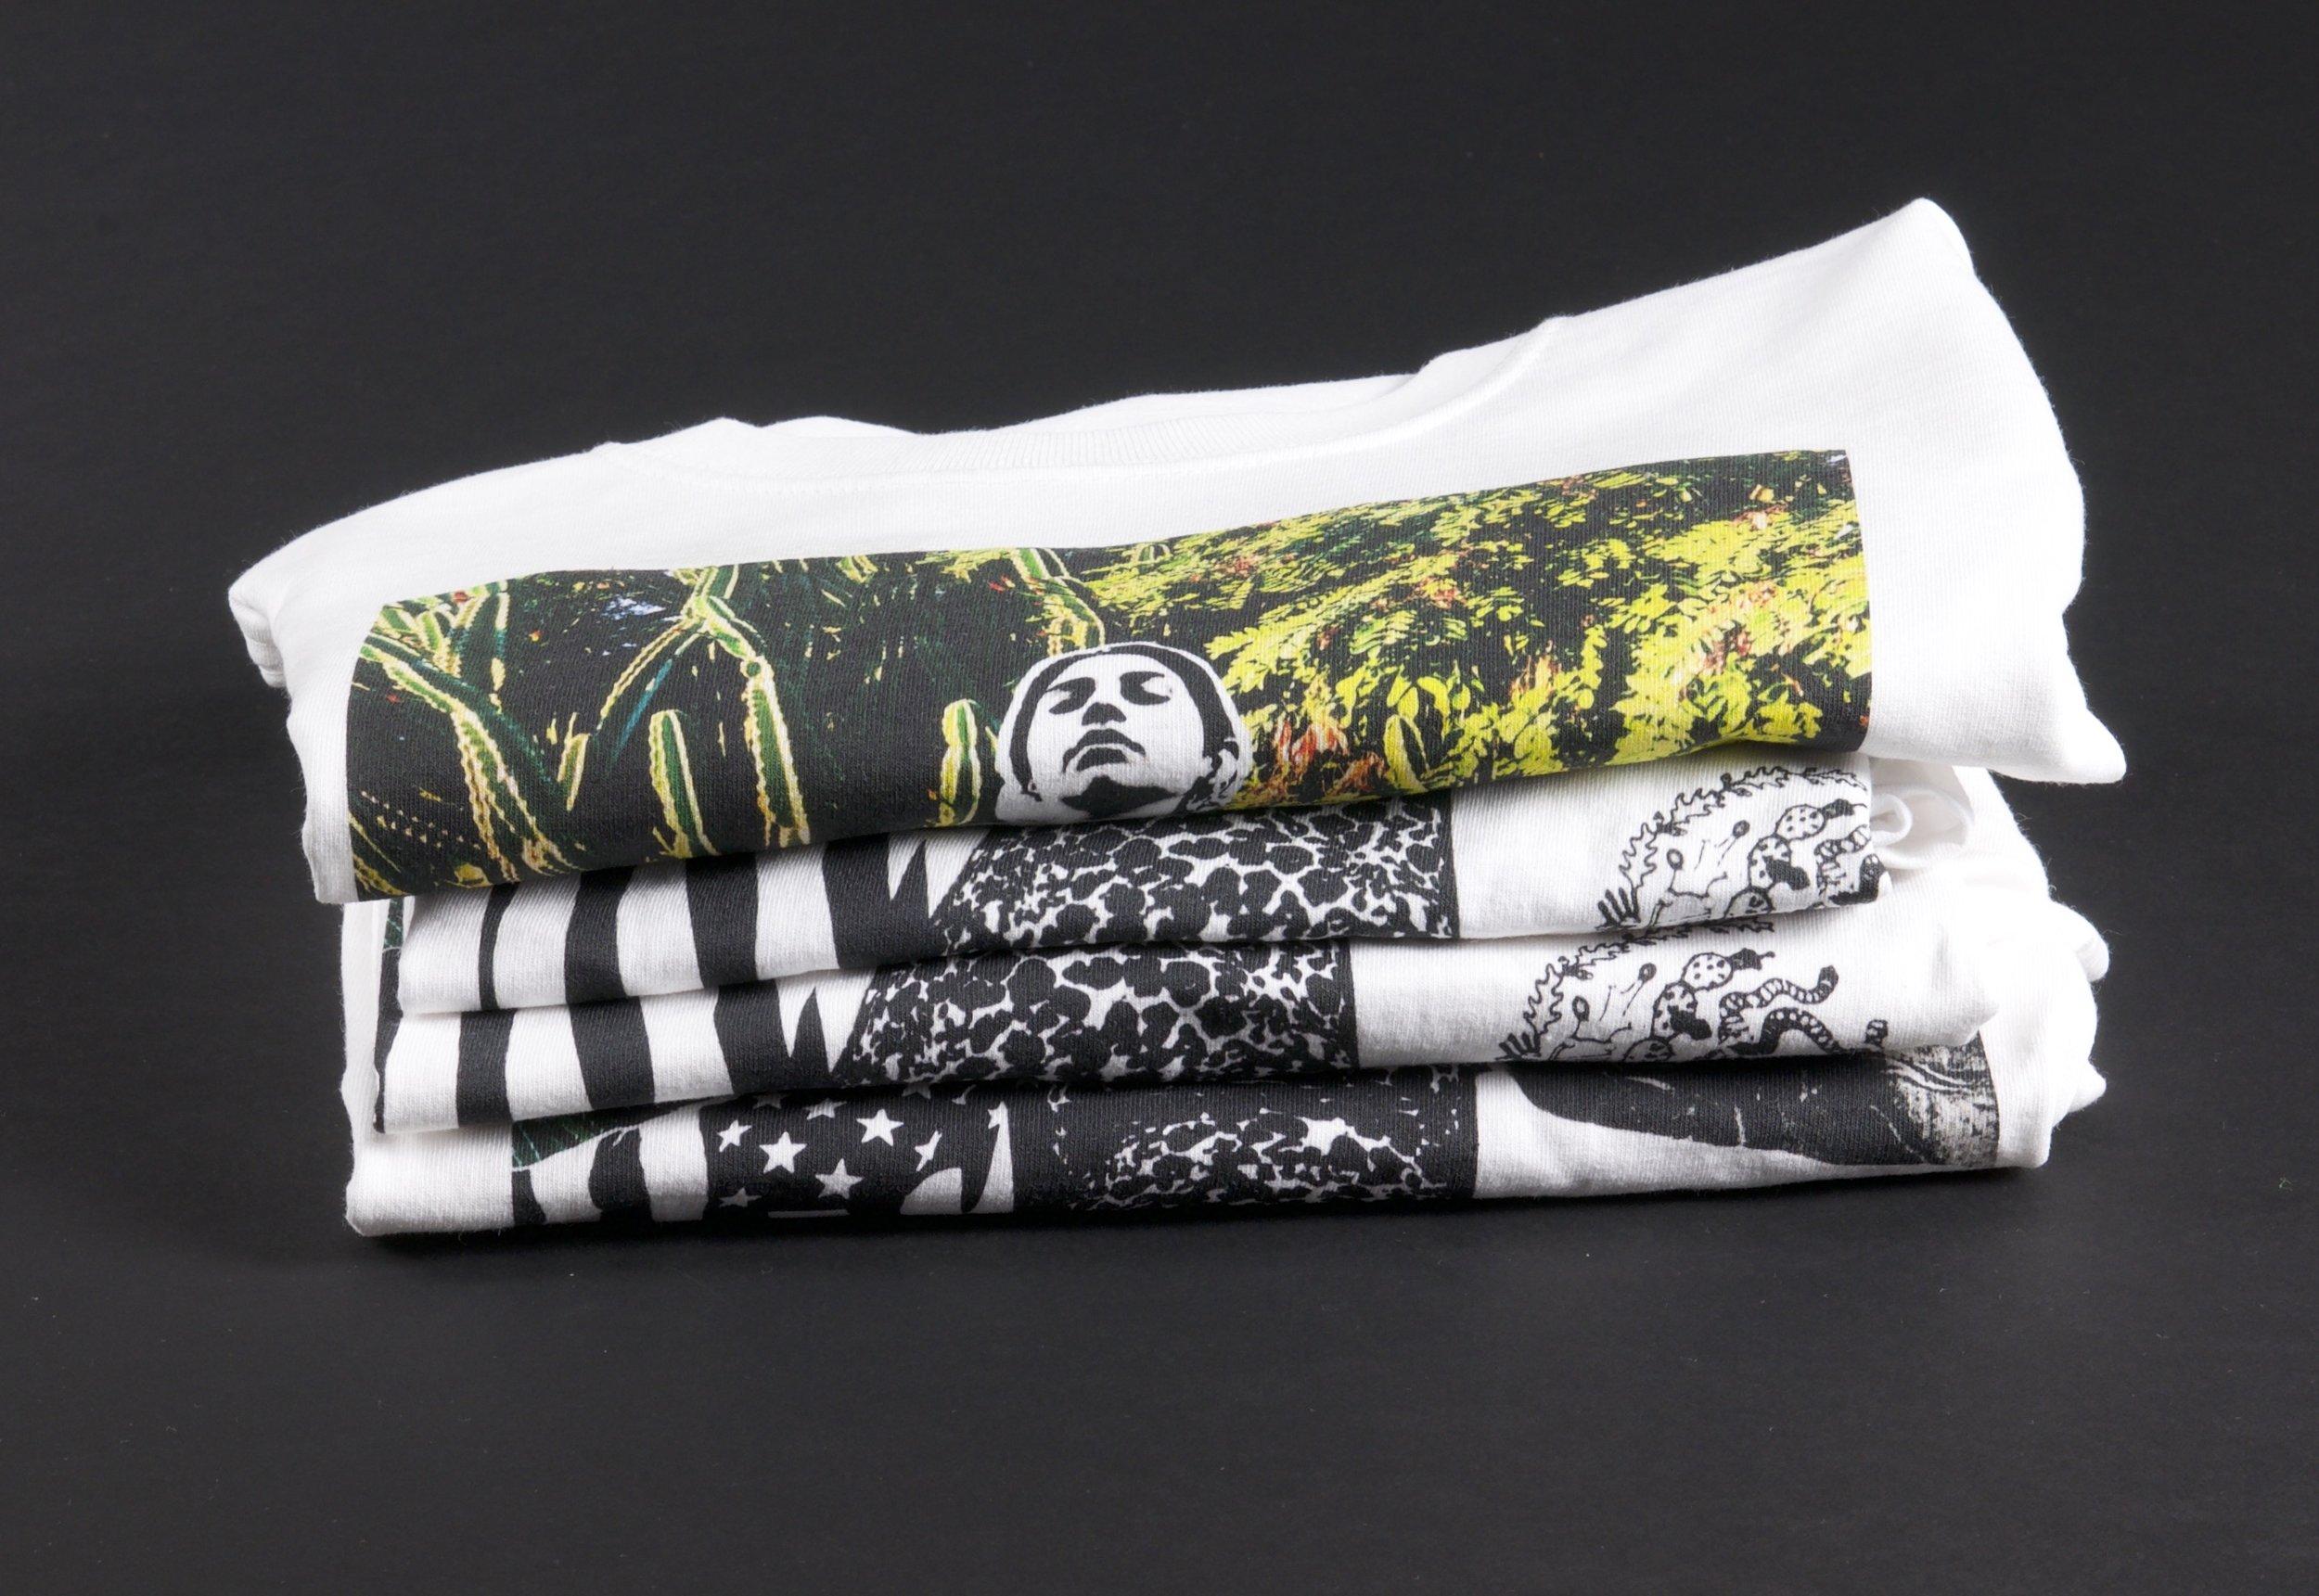 Angelica Tshirt stack .jpg